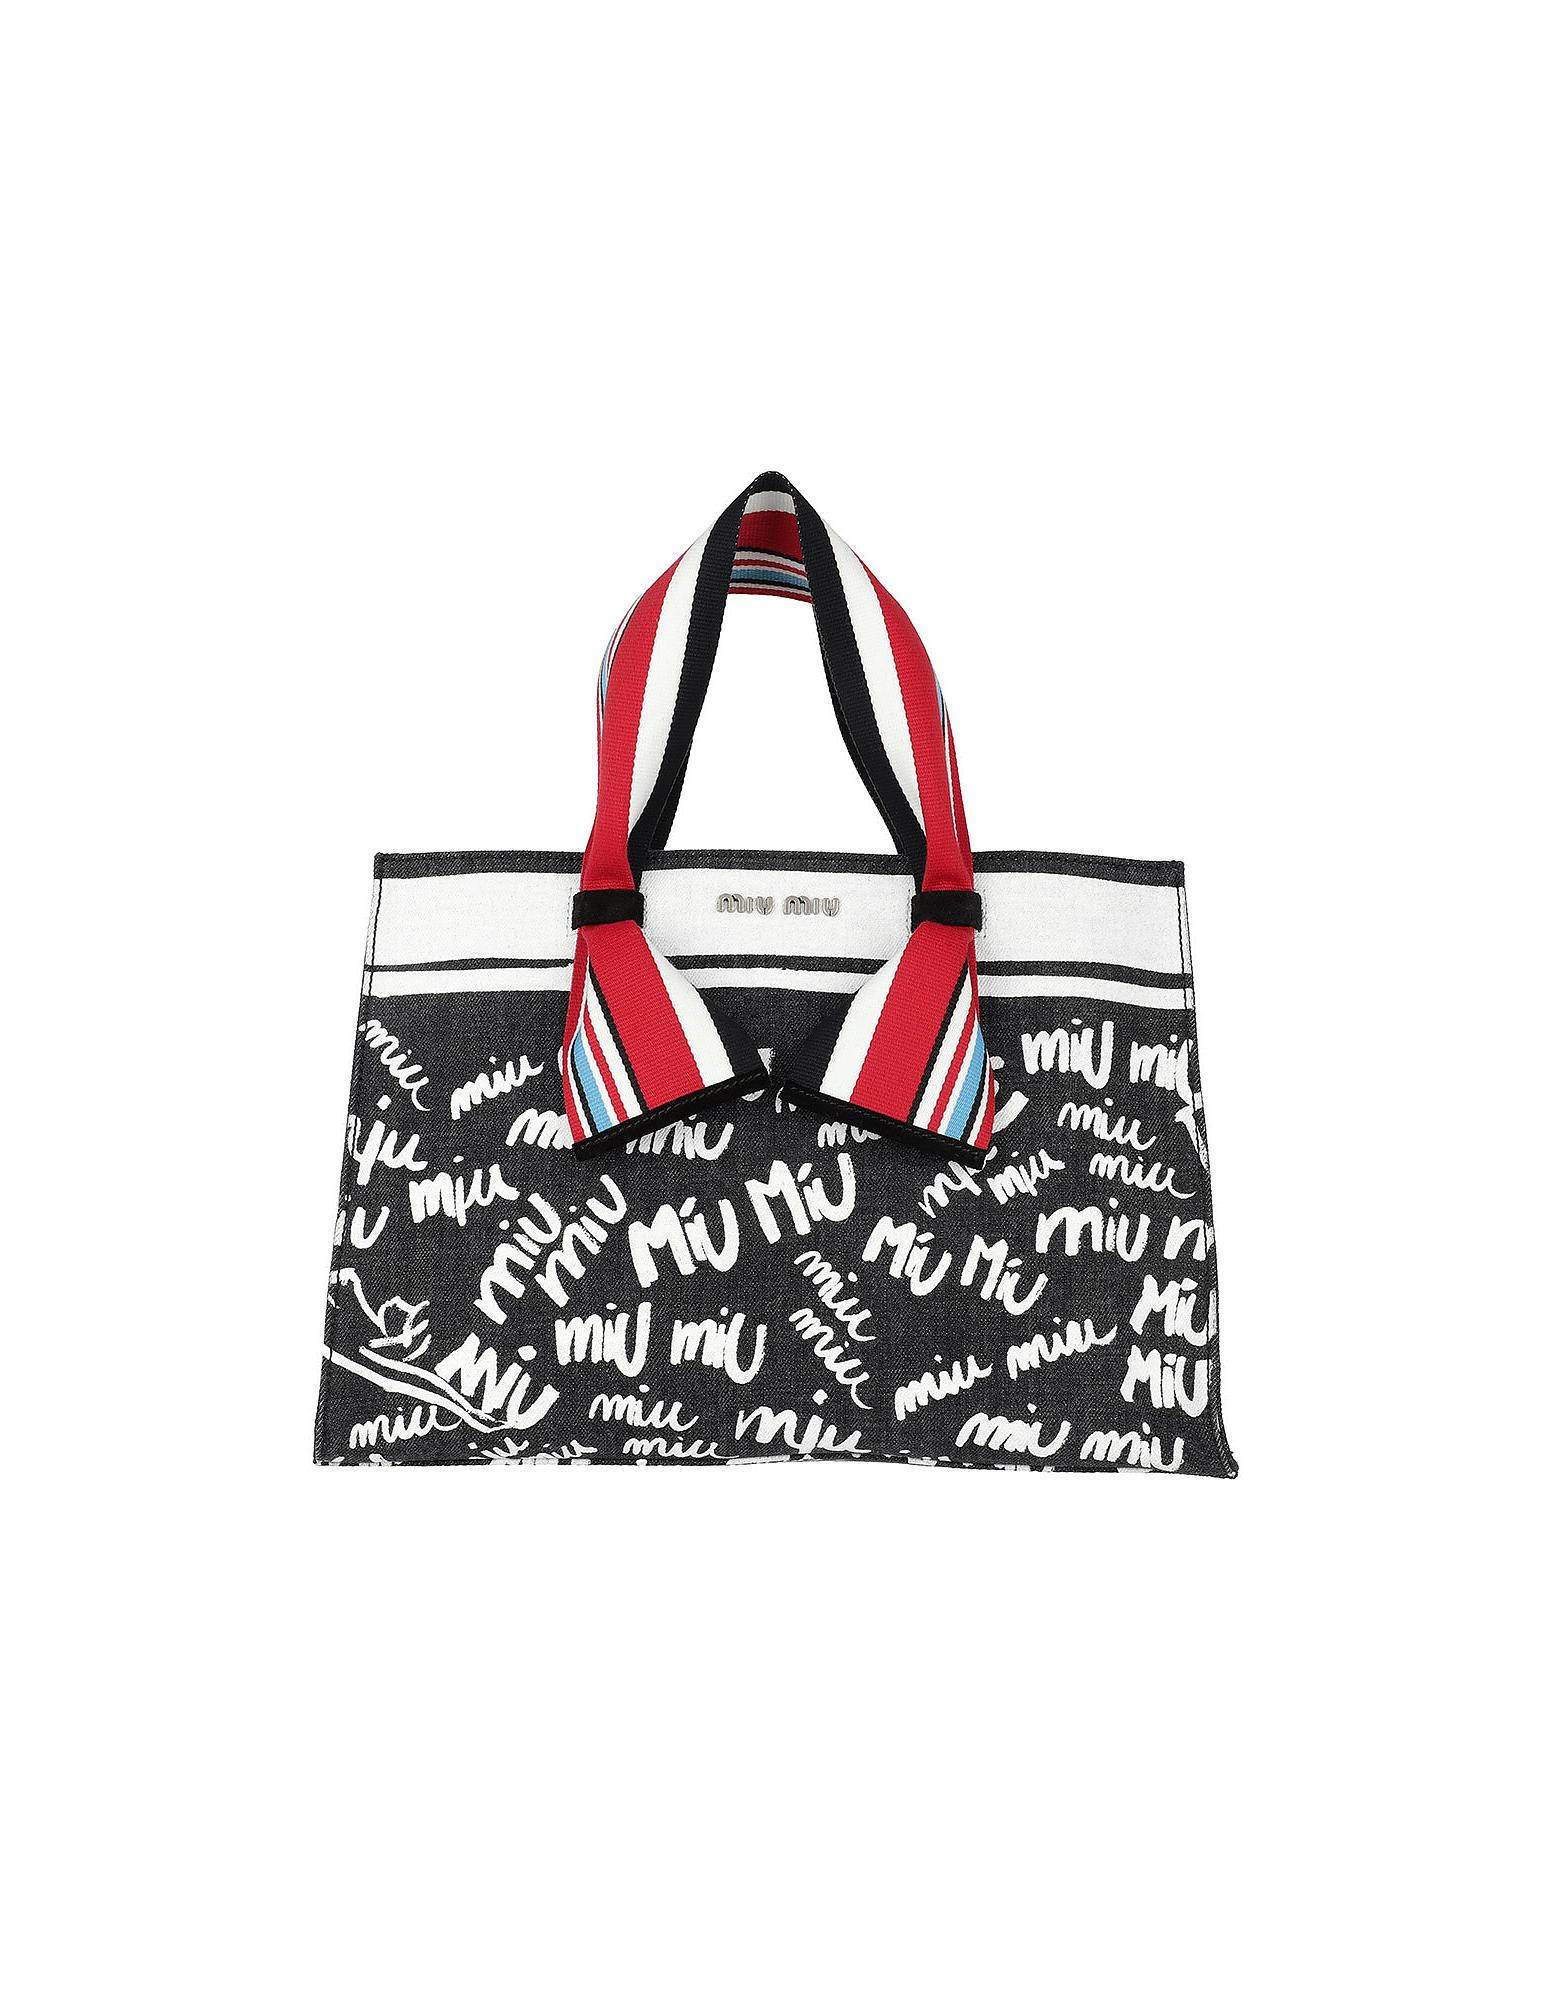 Miu Miu Denim Logo Shopping Bag Nero bianco in Gray - Lyst 4ef14a391f